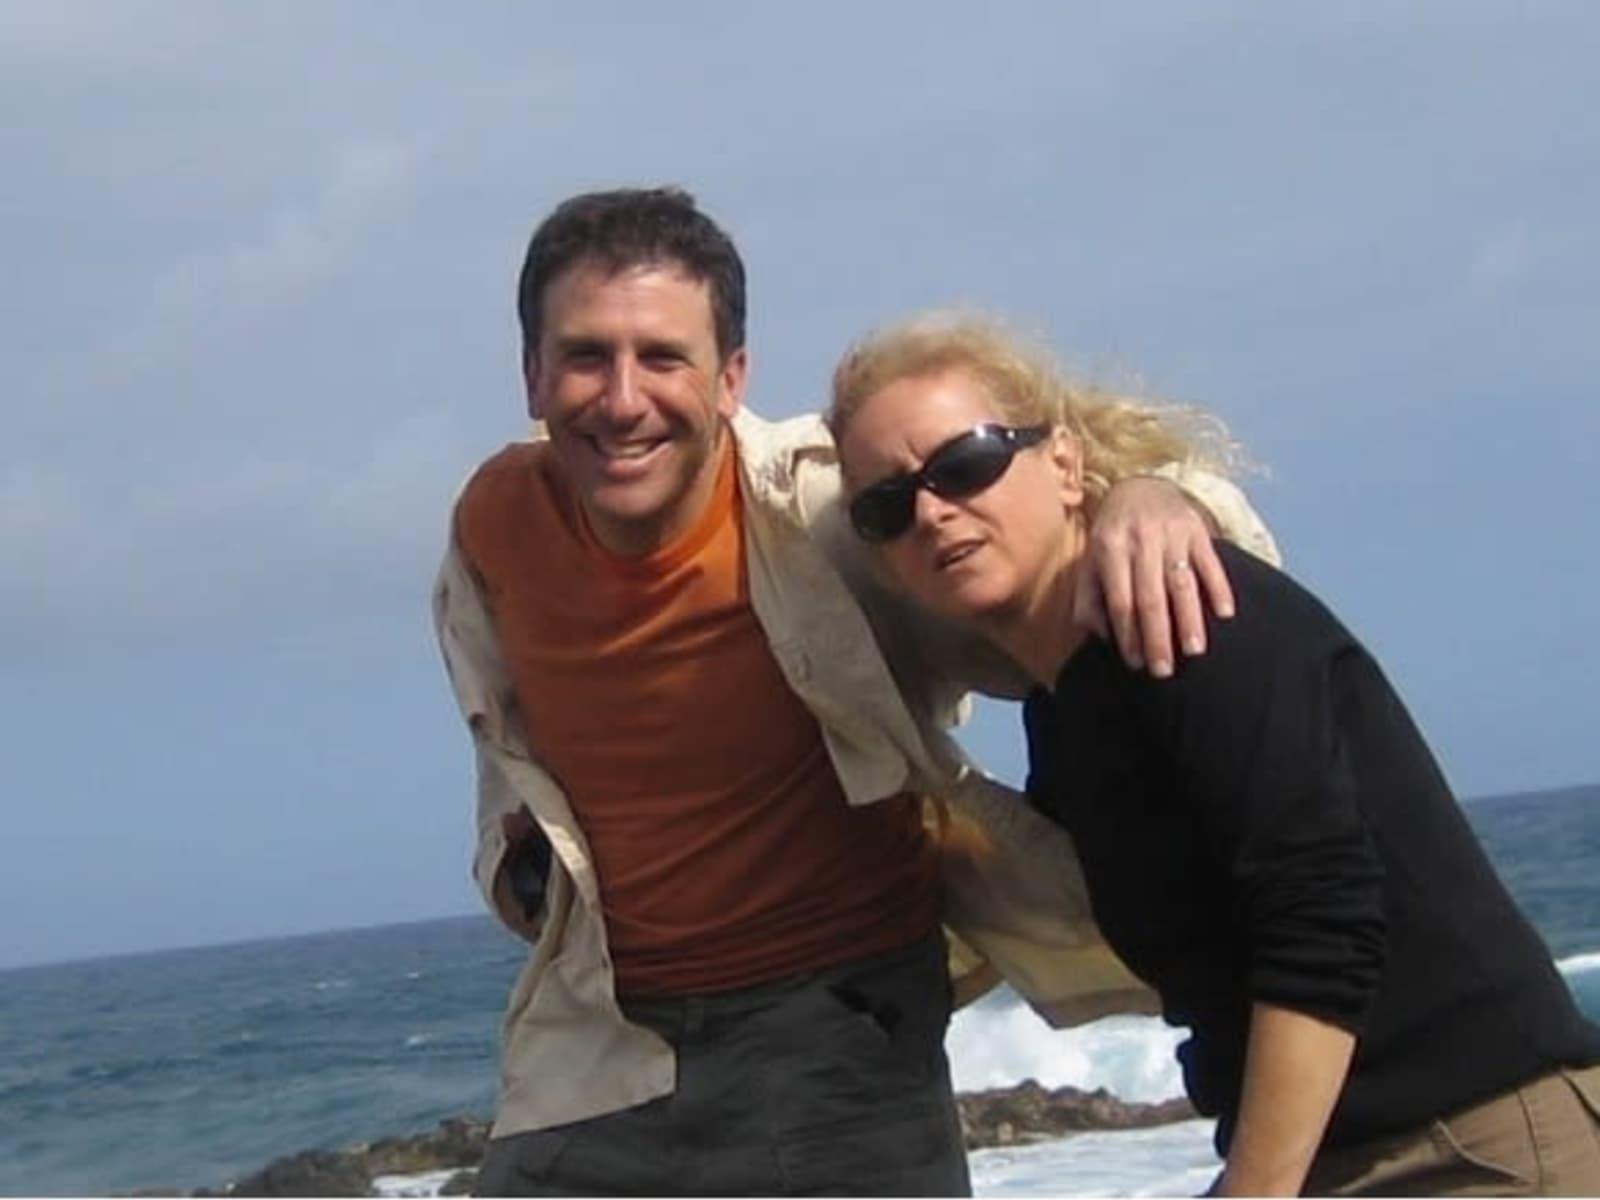 Stephanie & Douglas from Los Angeles, California, United States